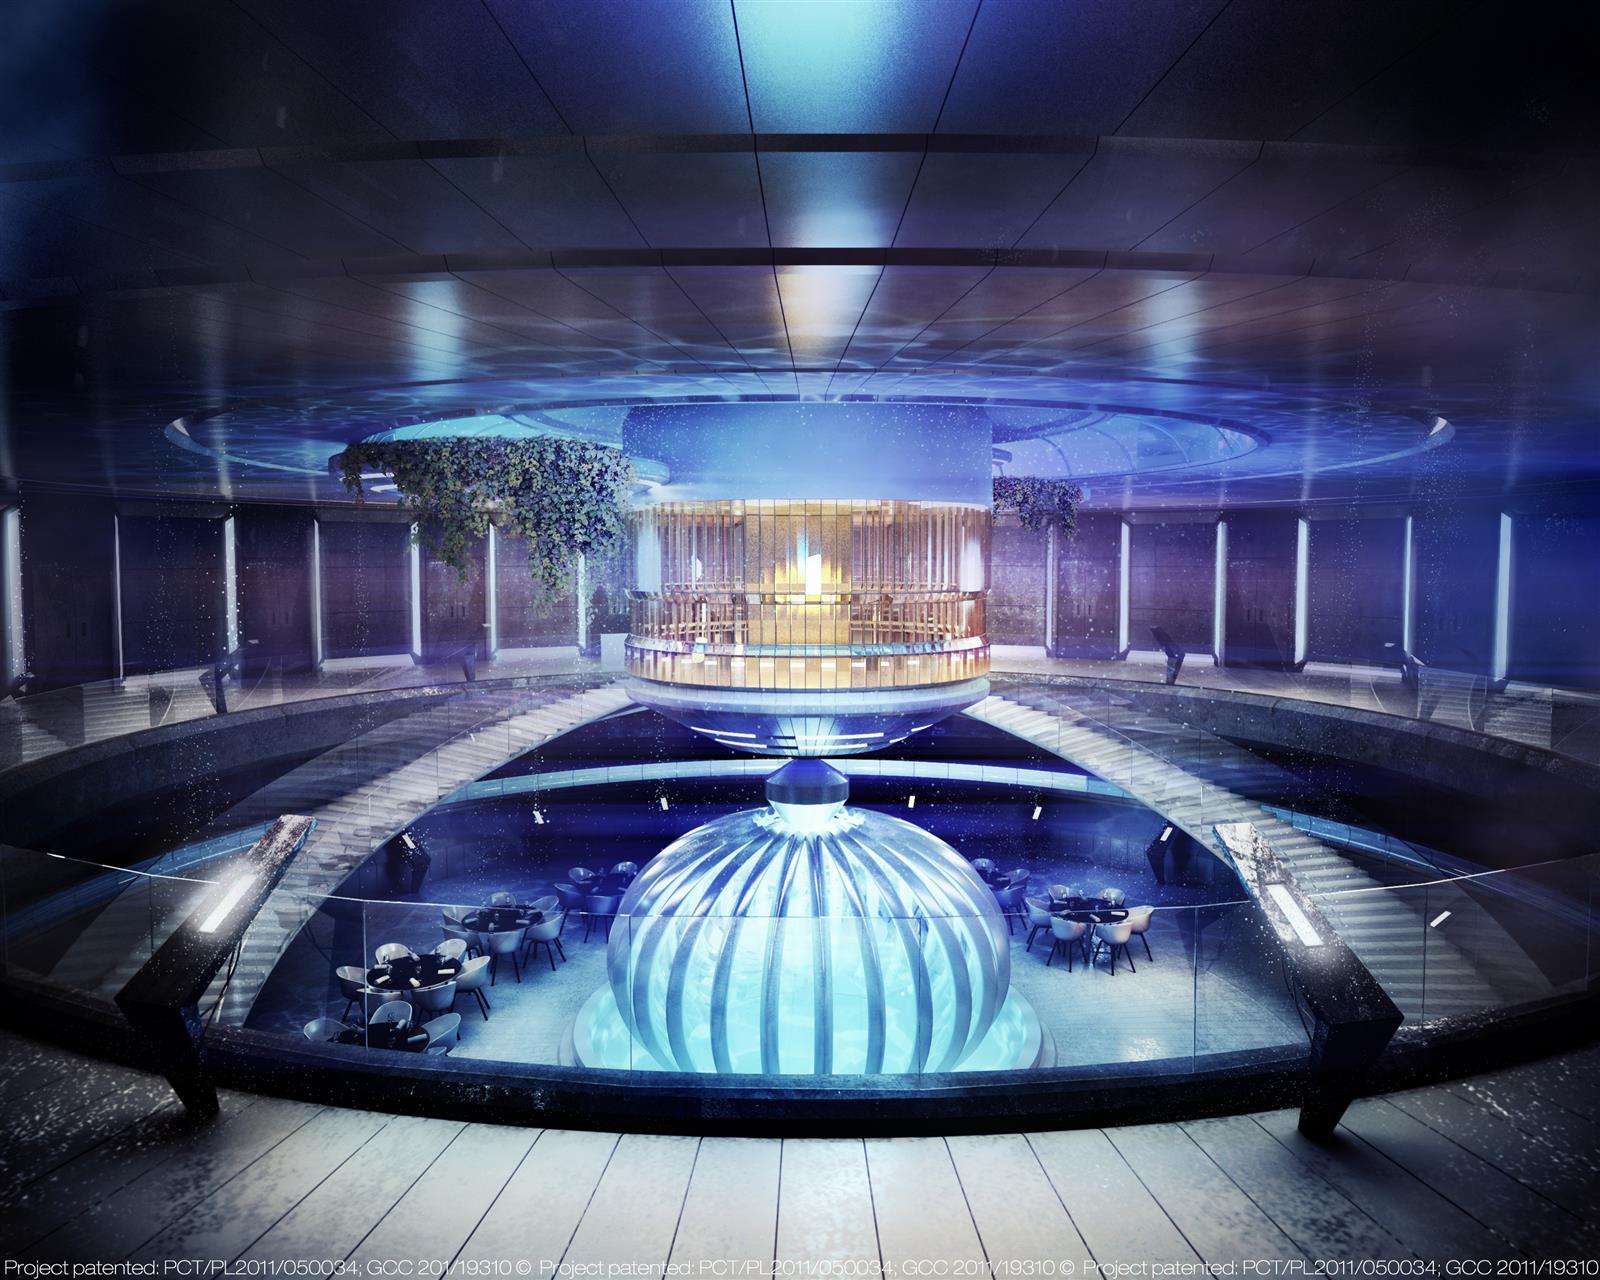 Water Discus Underwater Hotels In Dubai (12)